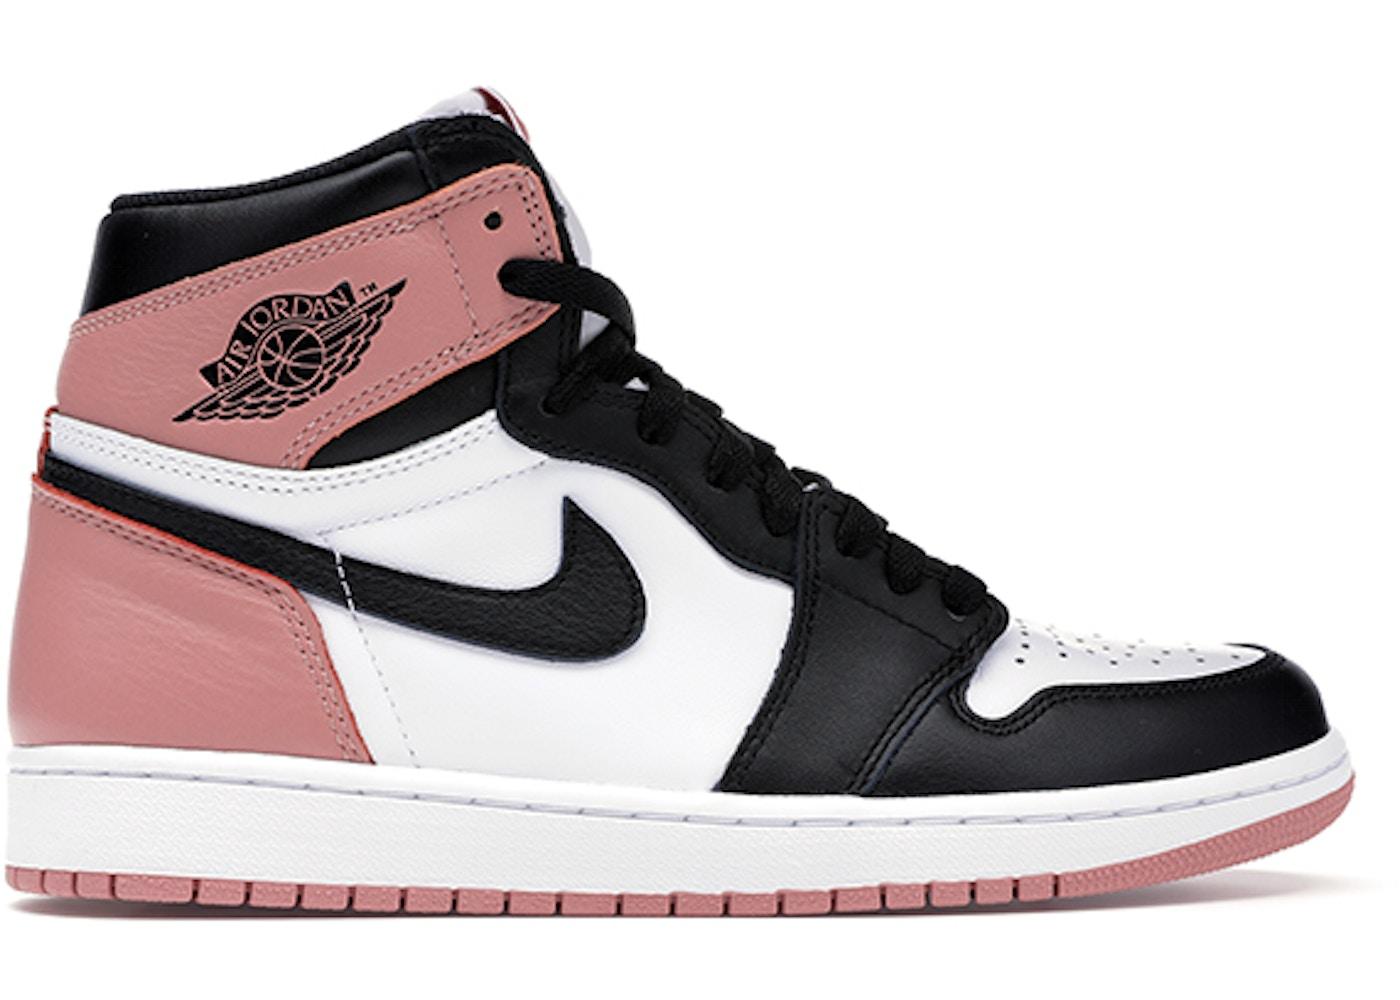 size 40 a7932 290fa Jordan 1 Retro High Rust Pink